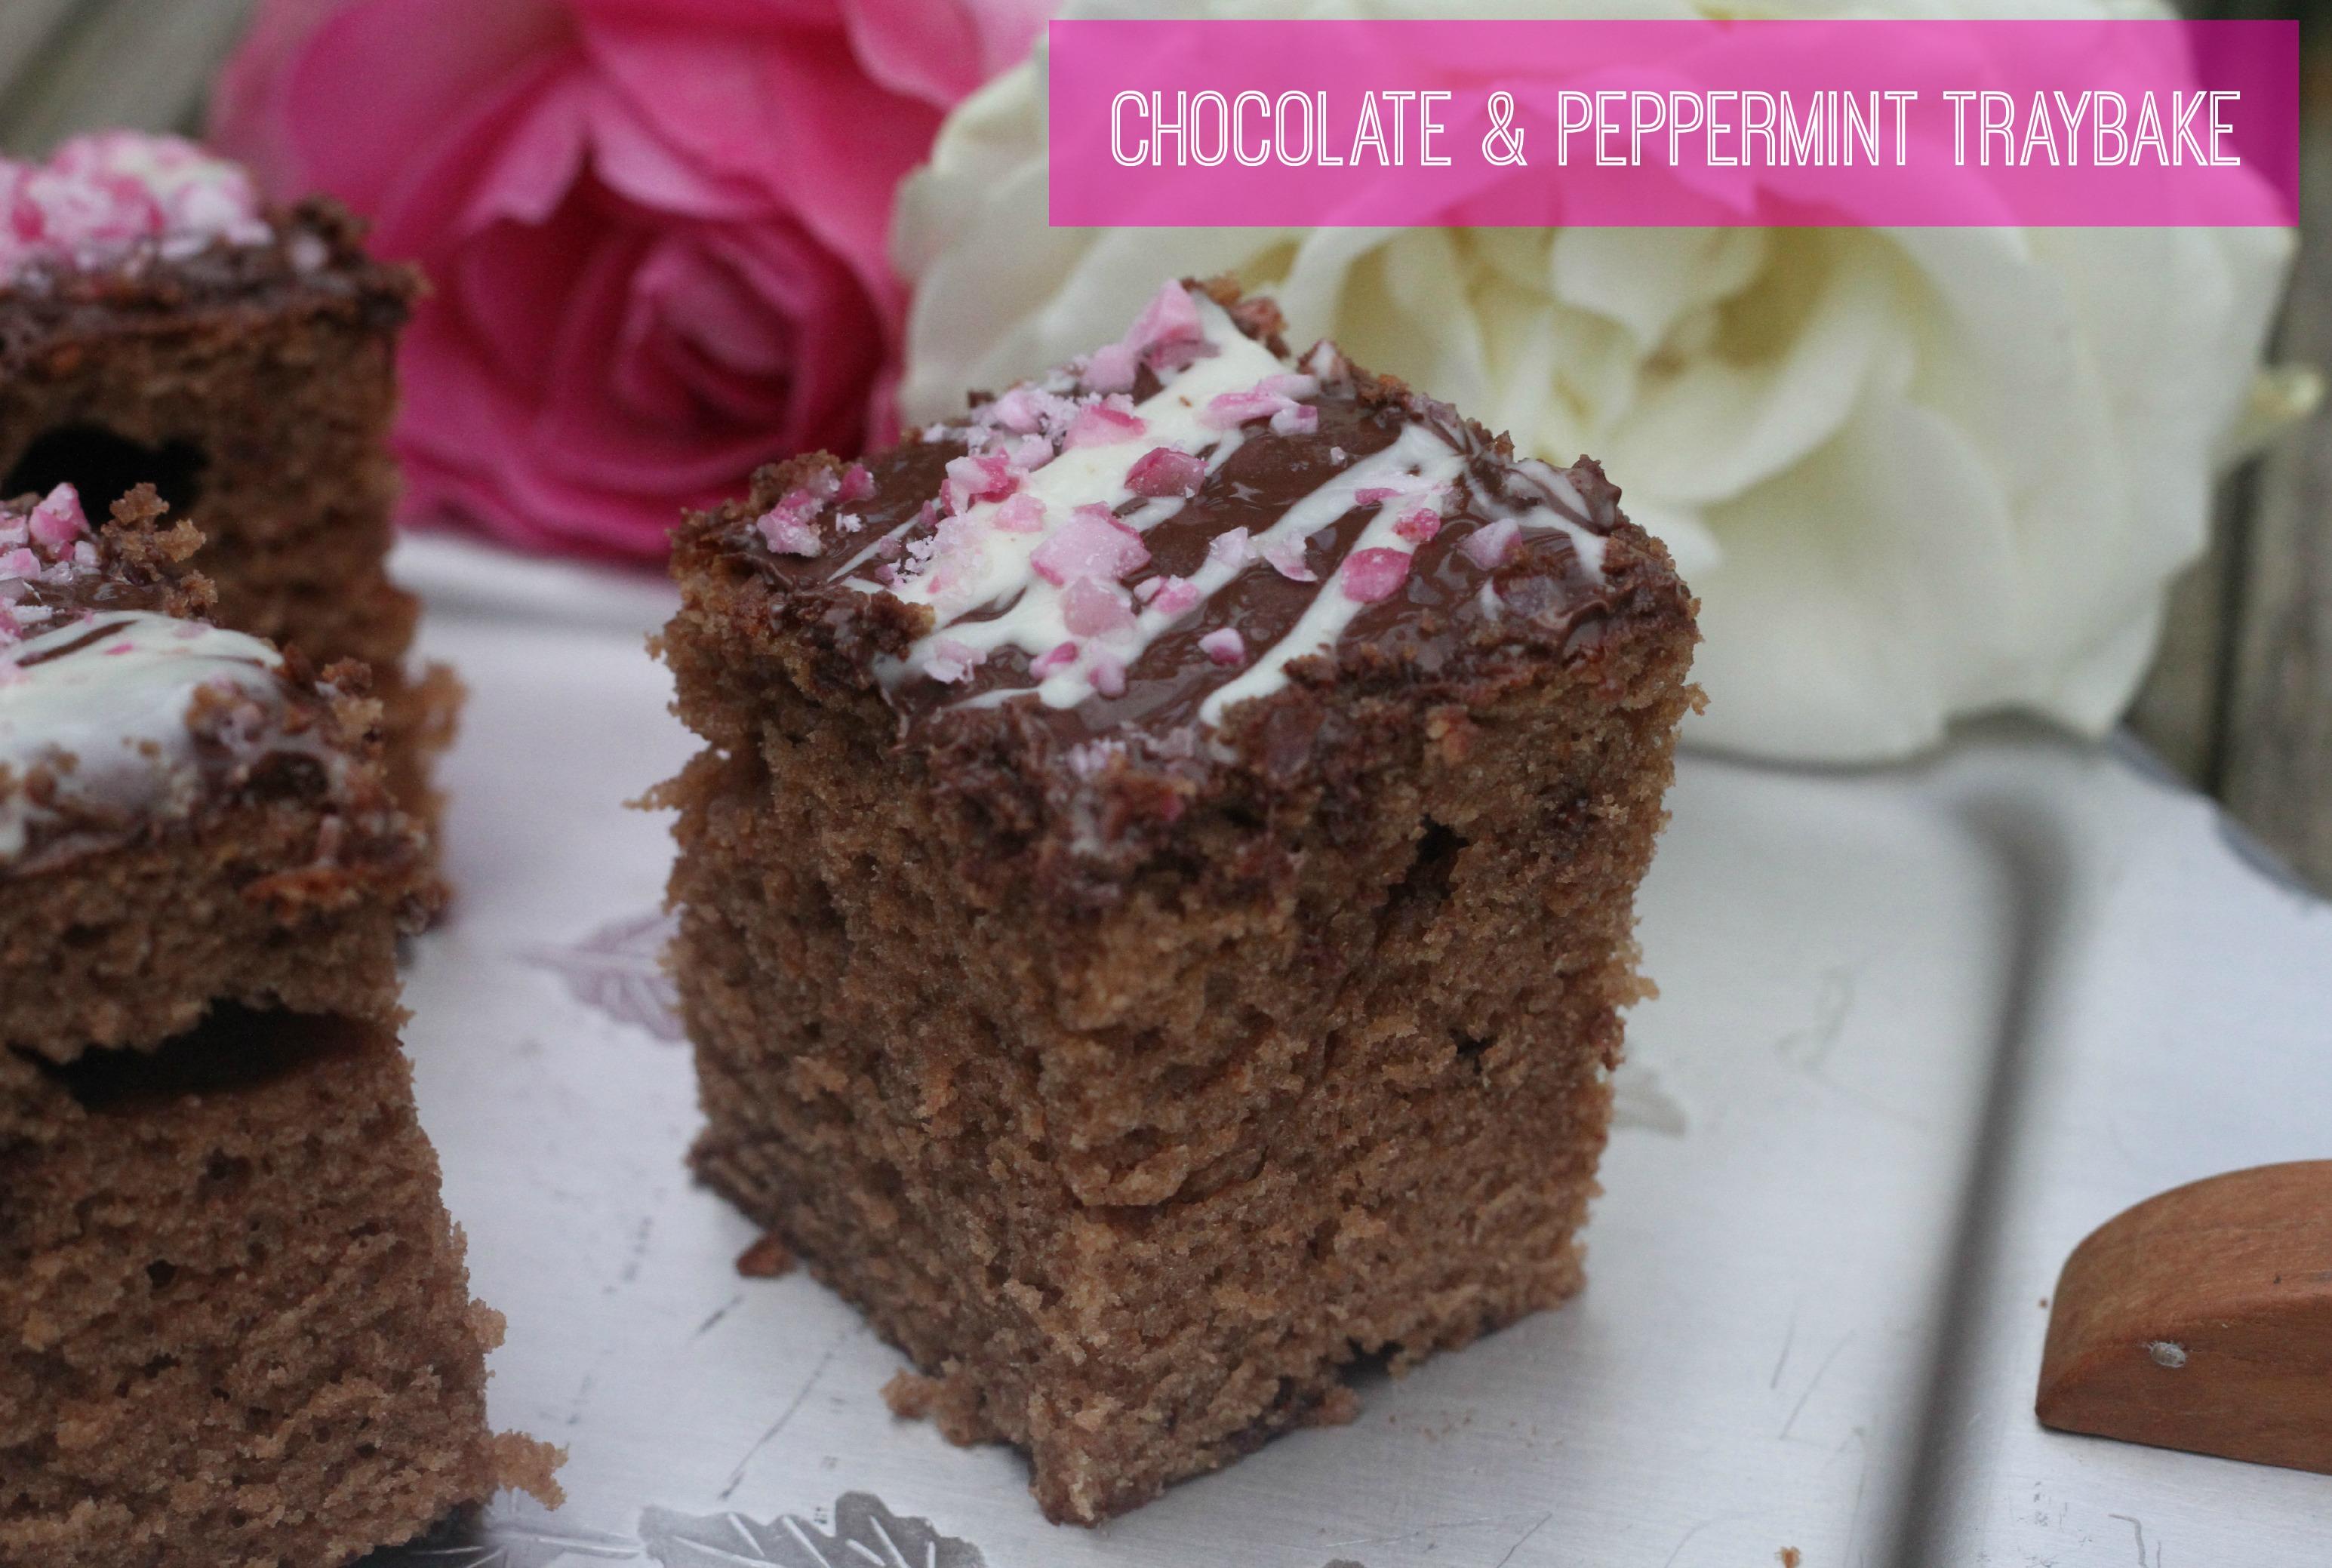 Chocolate & Peppermint Traybake